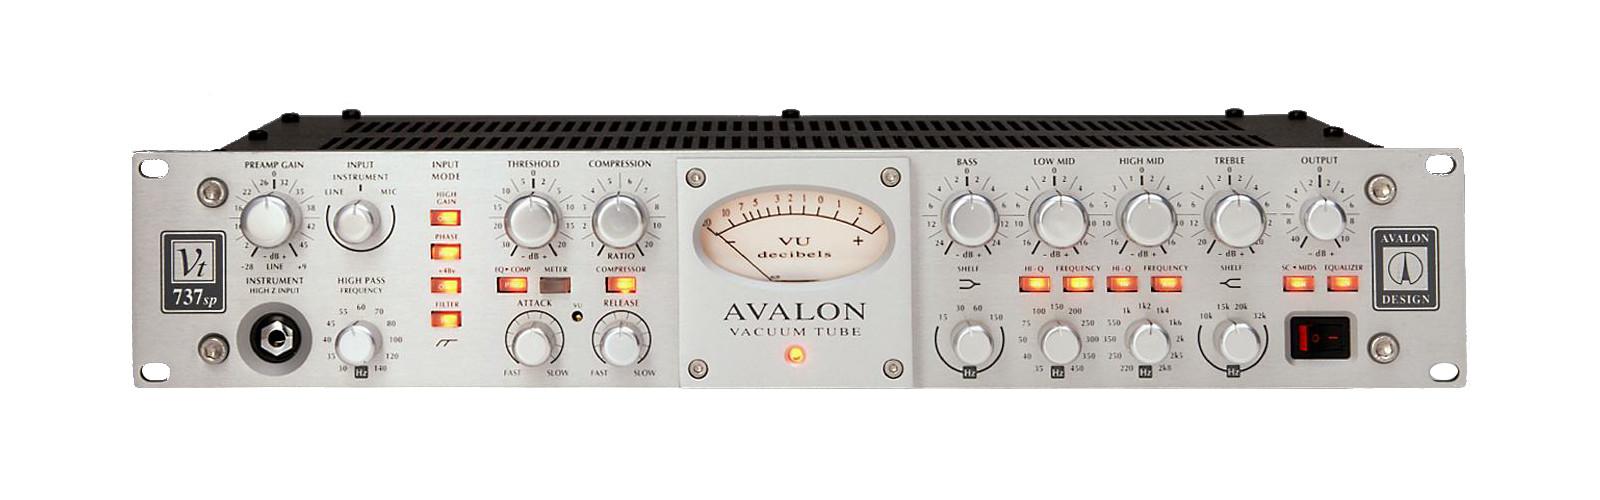 Avalon-VT-737 pre amp for voice over